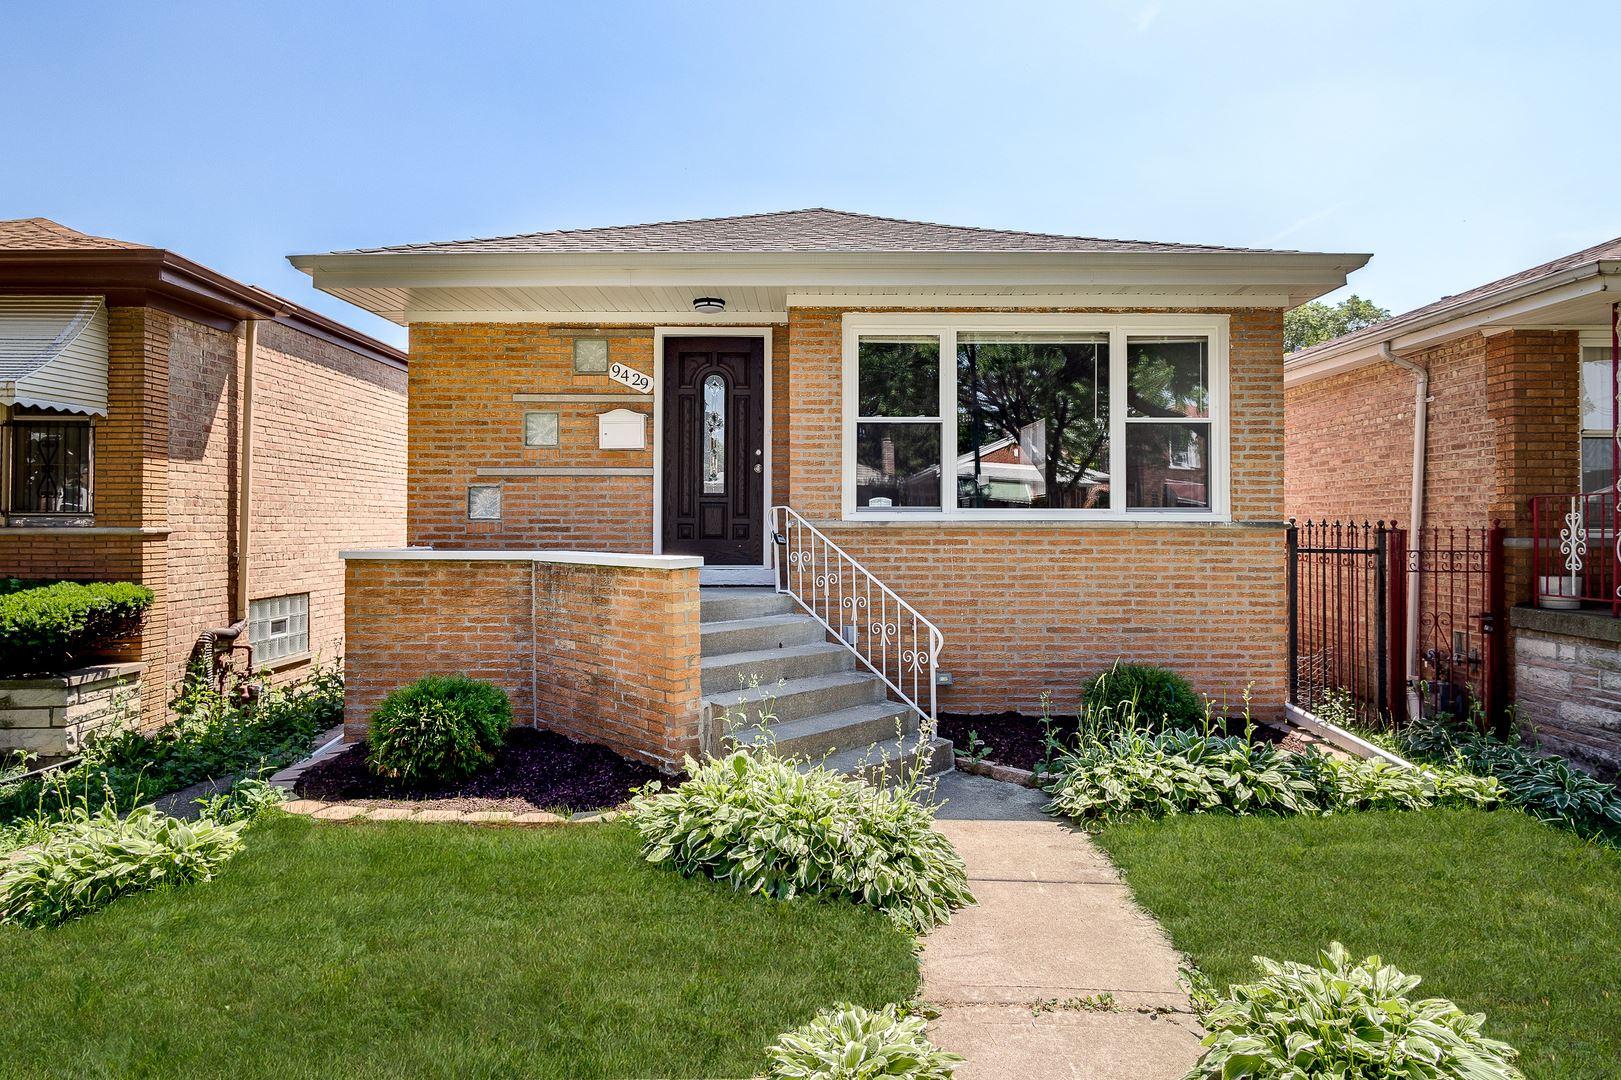 9429 S Prairie Avenue, Chicago, IL 60619 - #: 10773769